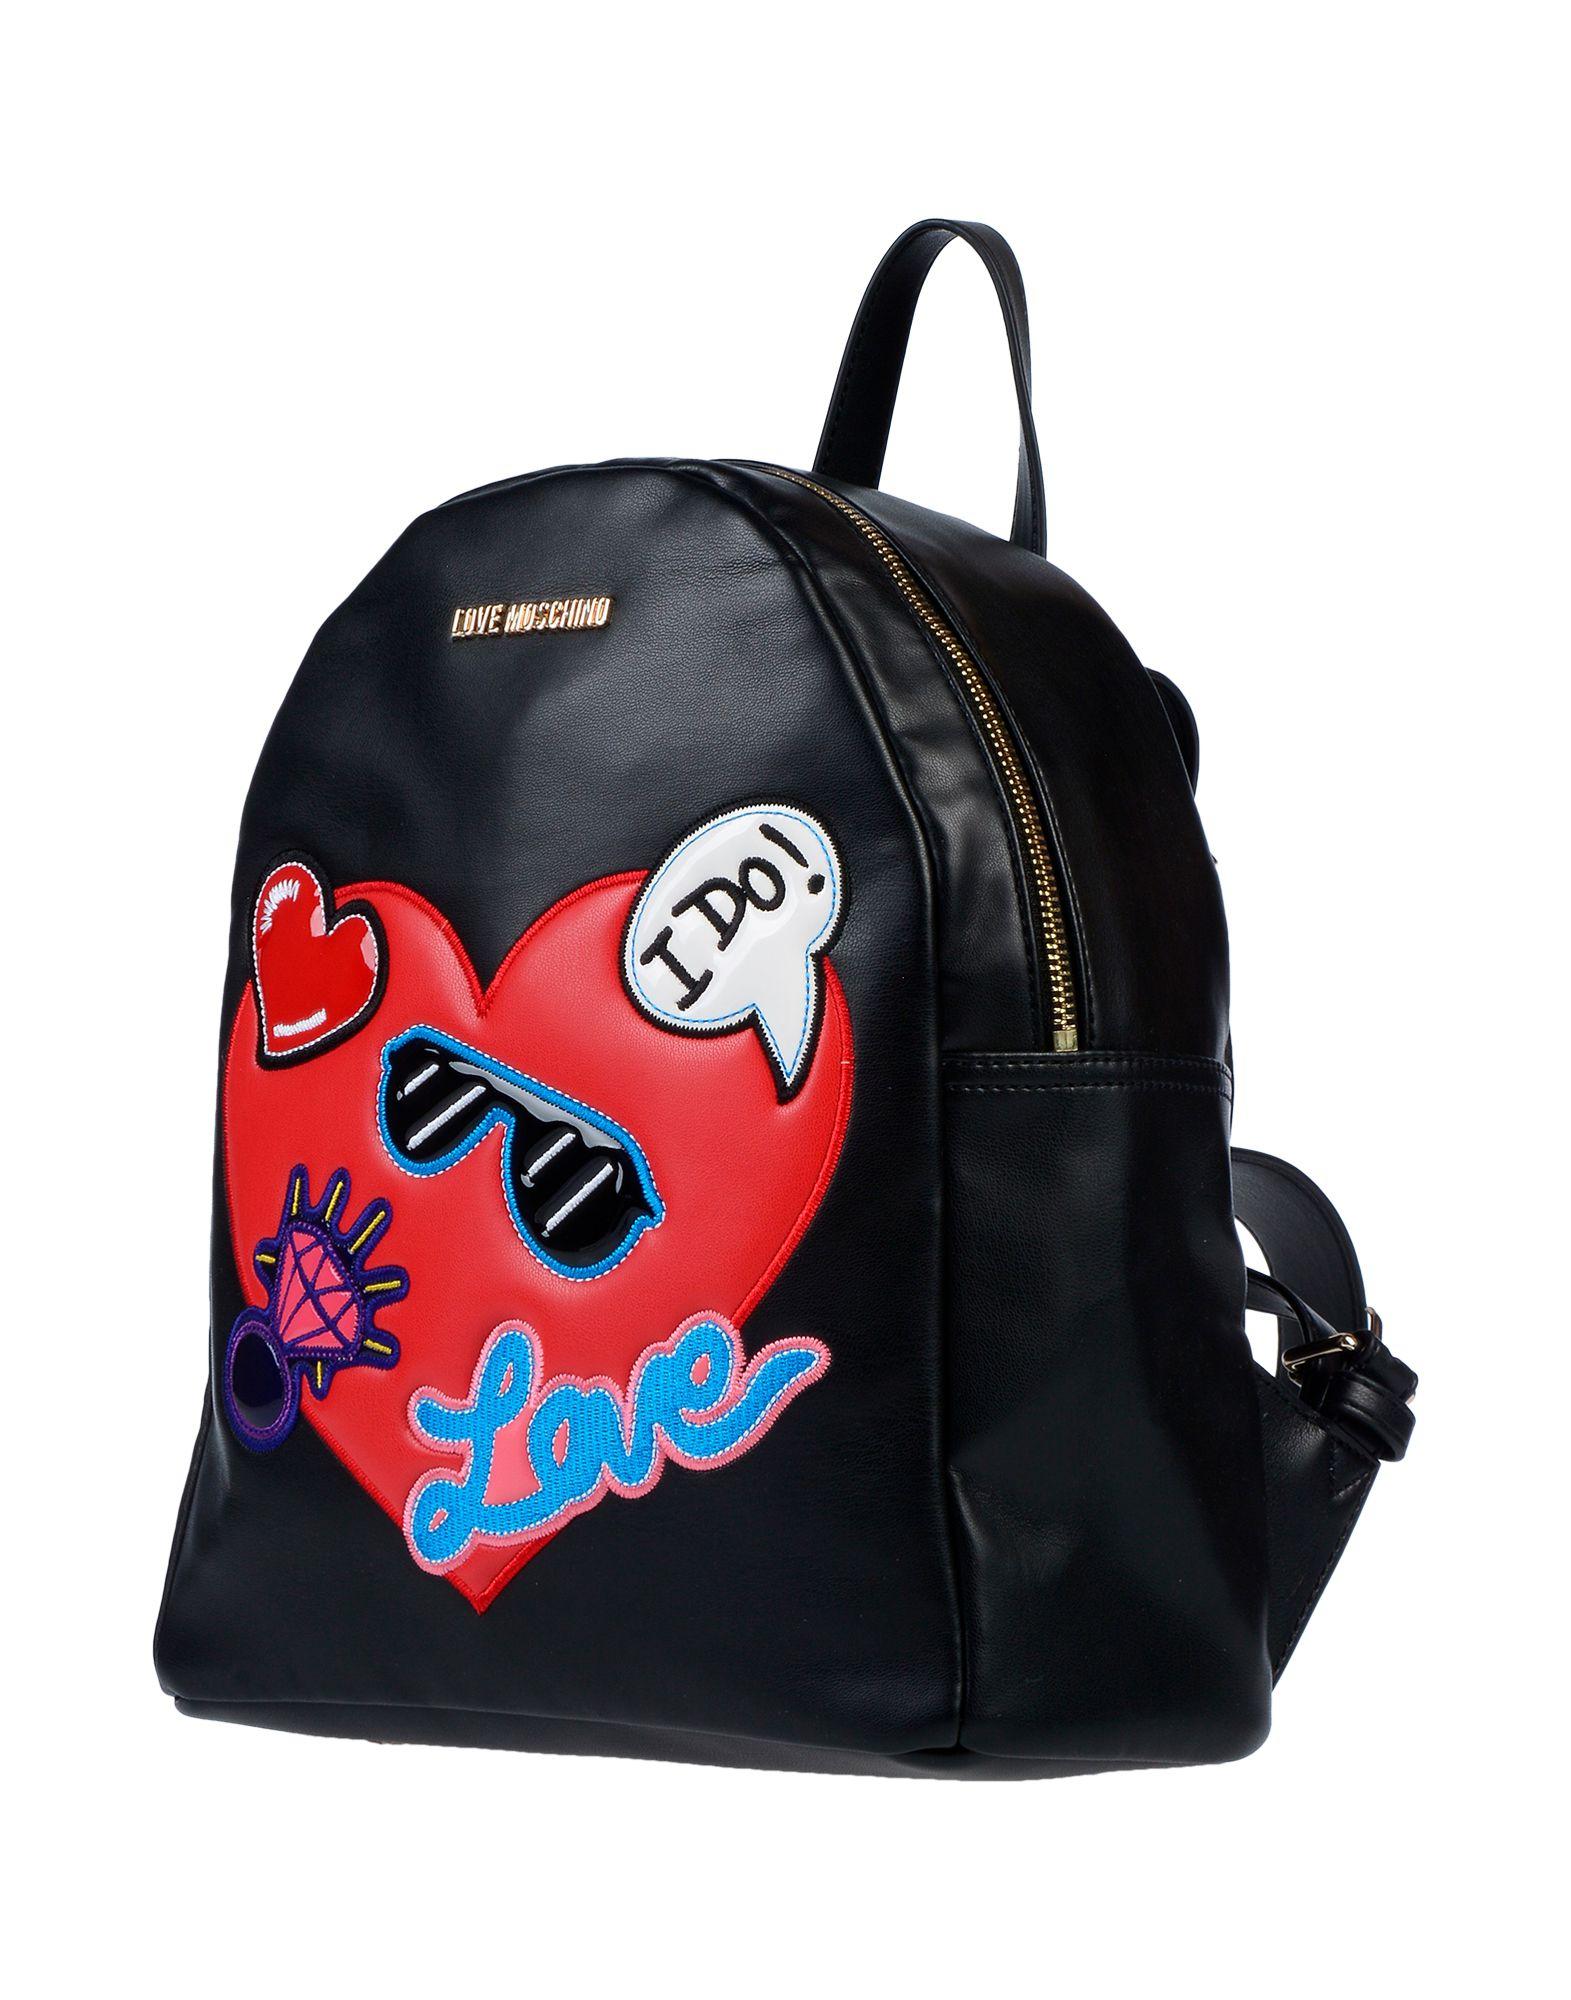 LOVE MOSCHINO Рюкзаки и сумки на пояс love wahshi  oiwas  легкая жизнь сумки